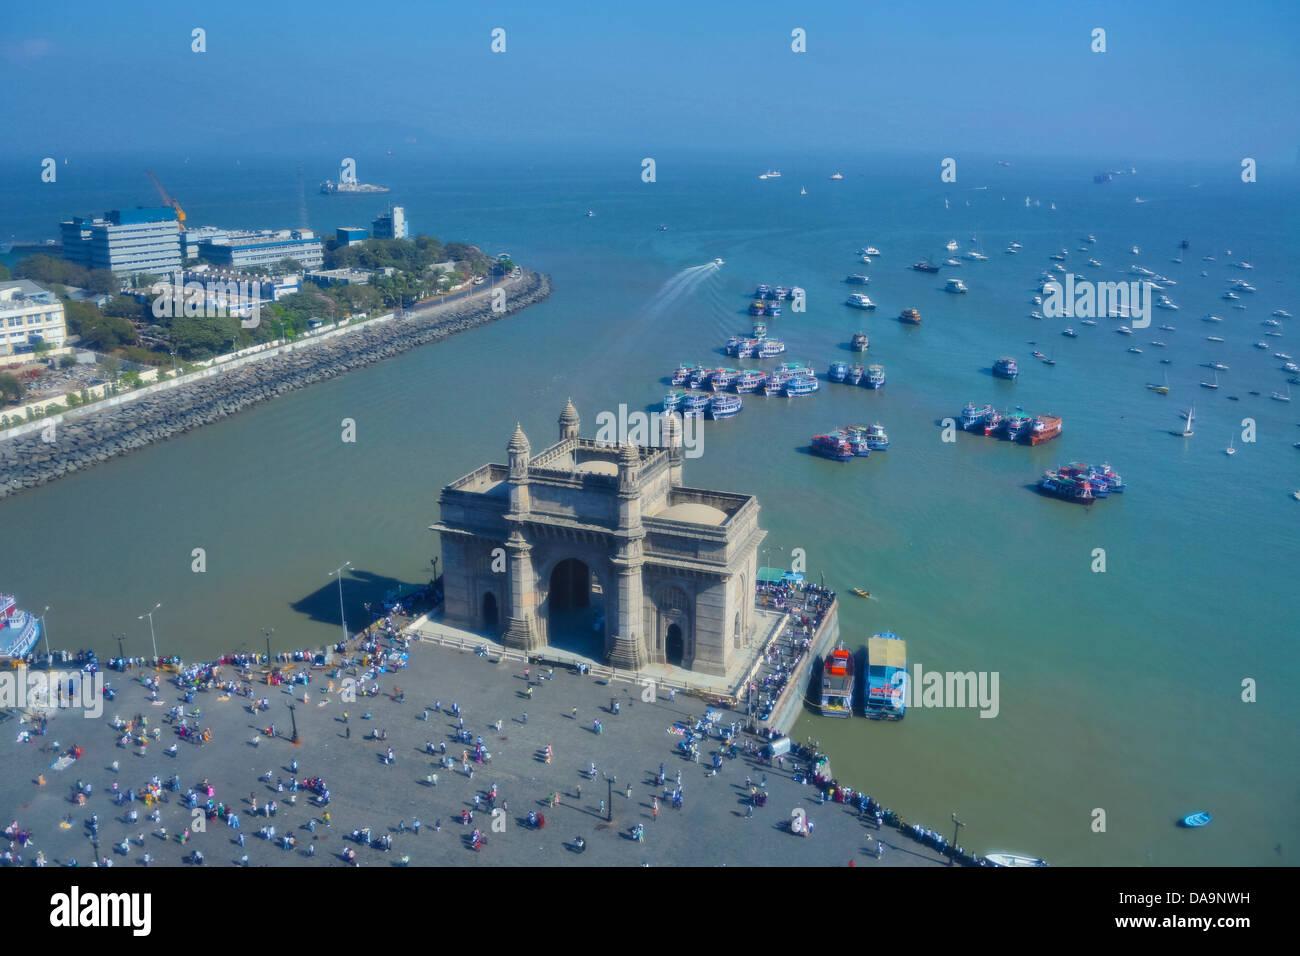 L'Inde, l'Inde, Asie, Maharashtra, Mumbai, Bombay, Ville, District, Colaba, porte de l'Inde, l'Inde Photo Stock